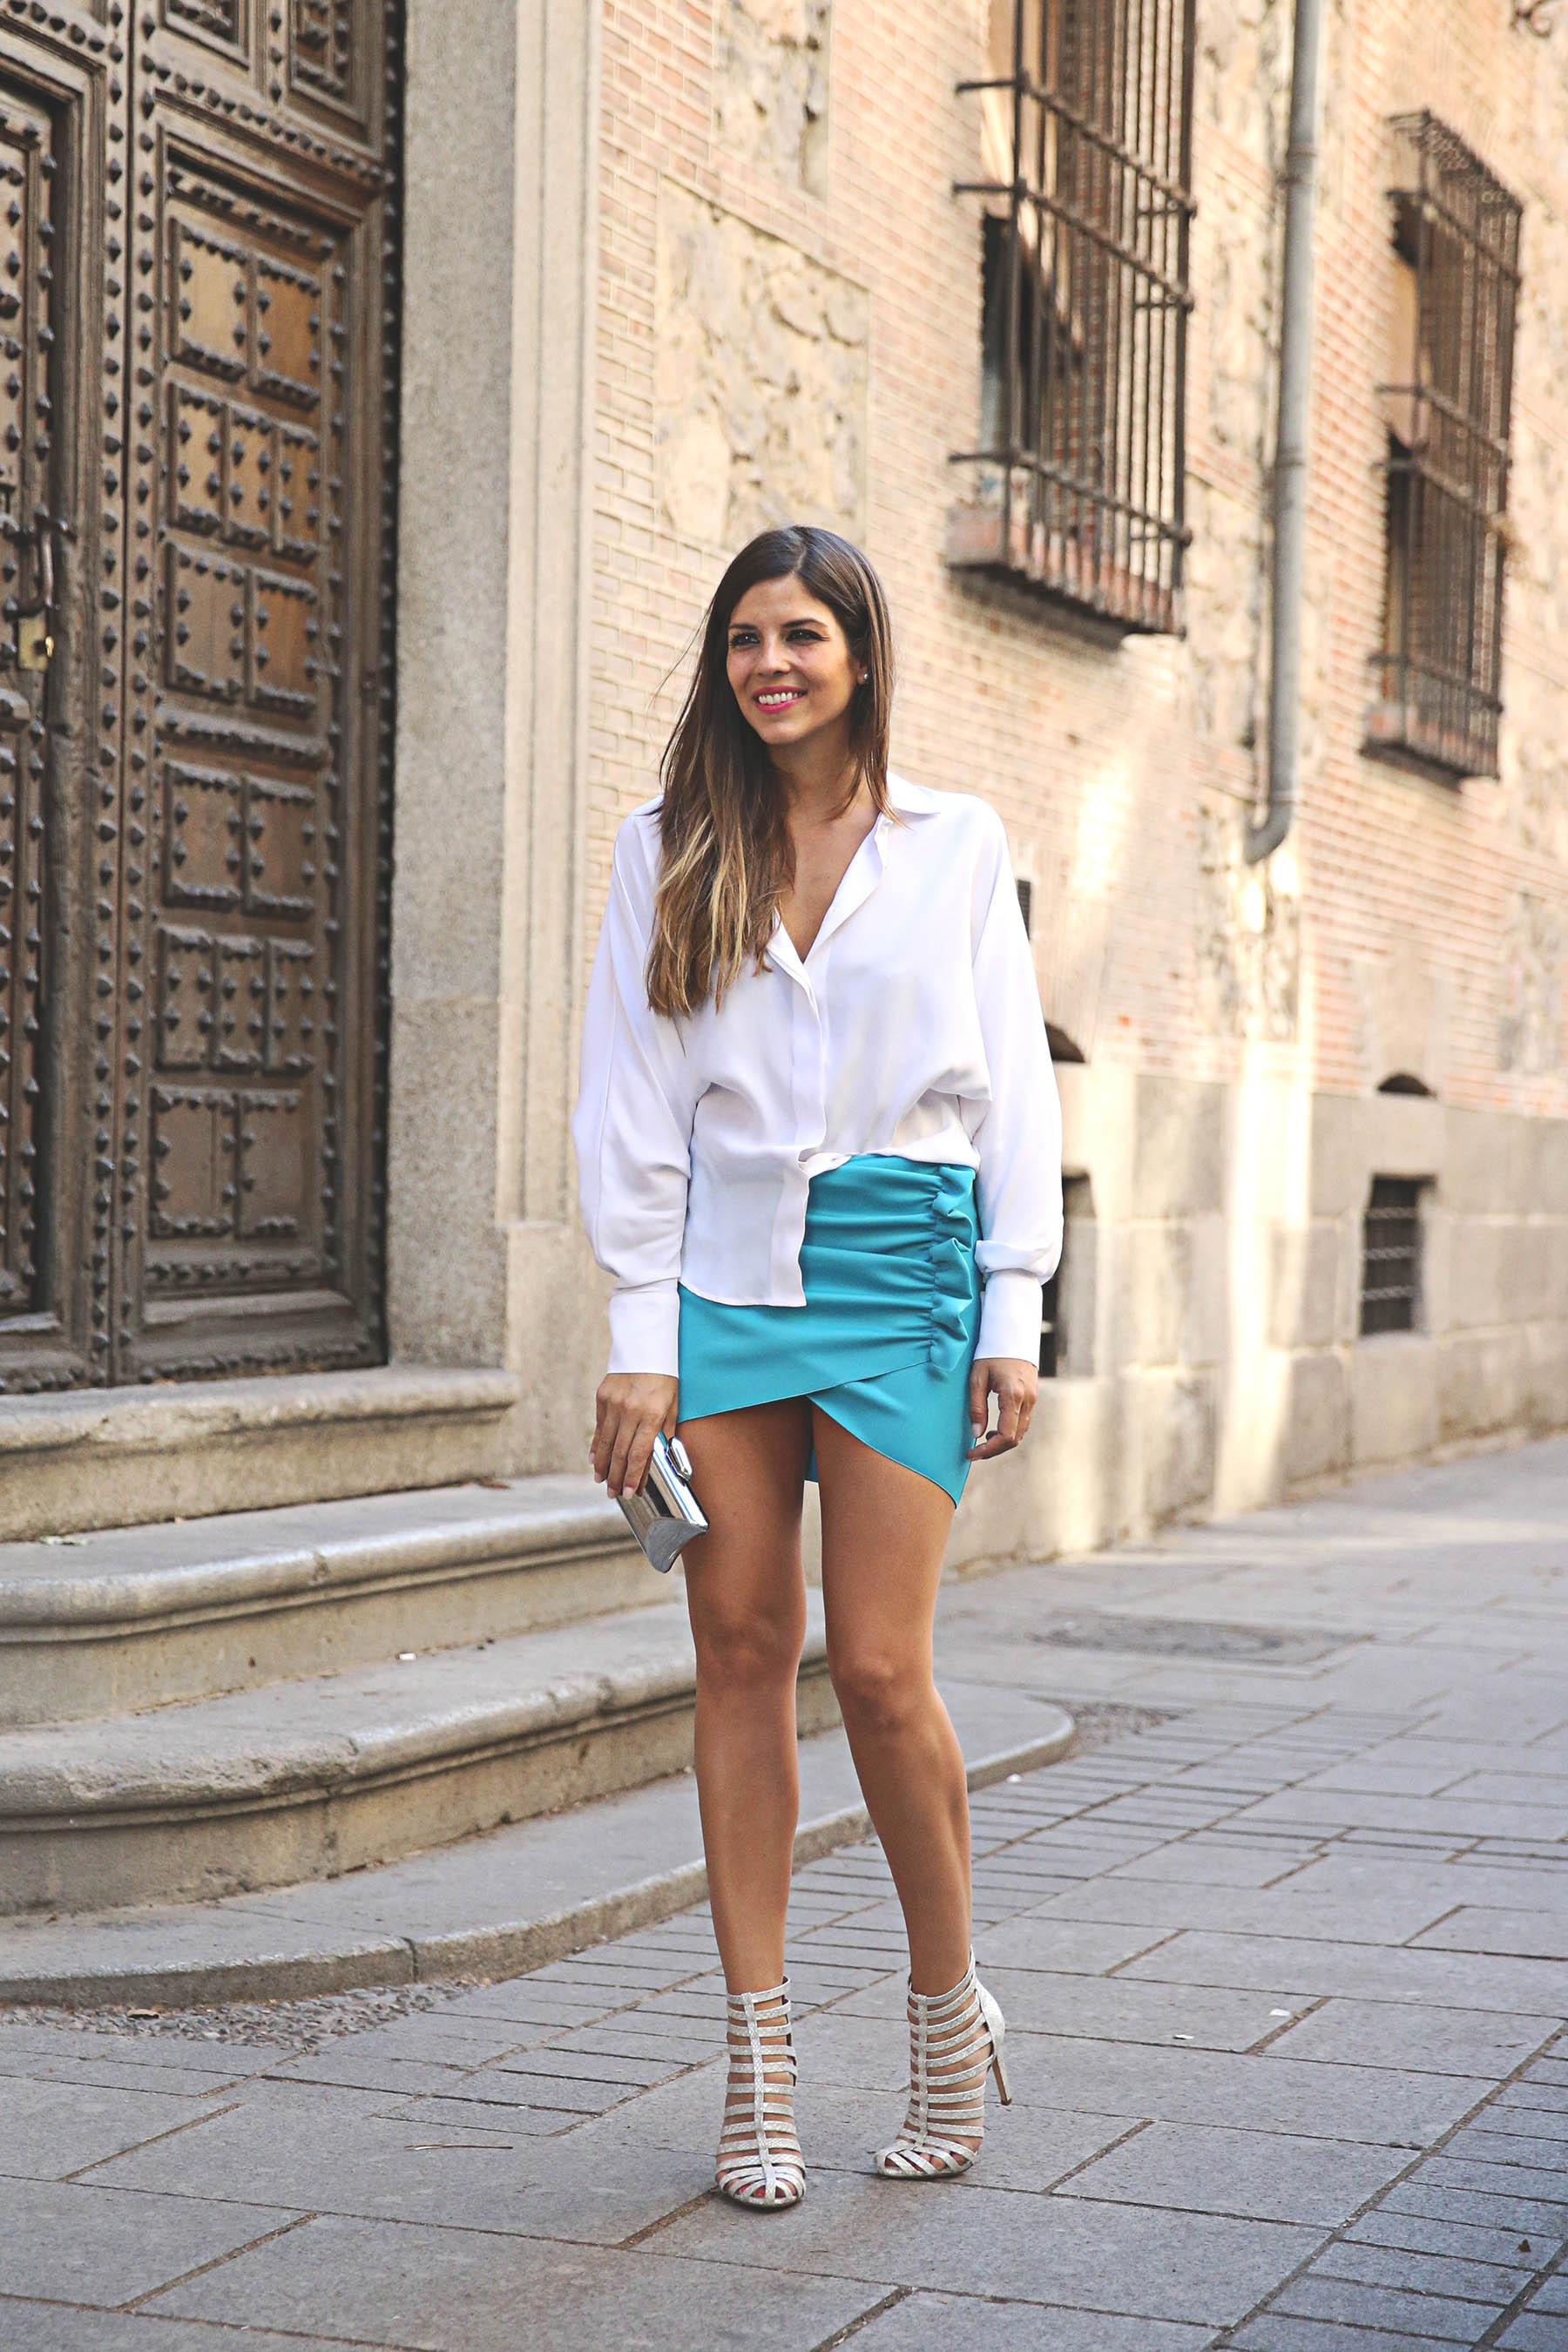 trendy-taste-look-outfit-street-style-ootd-blog-blogger-fashion-spain-moda-españa-lolali-blue-neopreno-azul-falda-blusa-bcbg-338-sandalias-serpiente-8